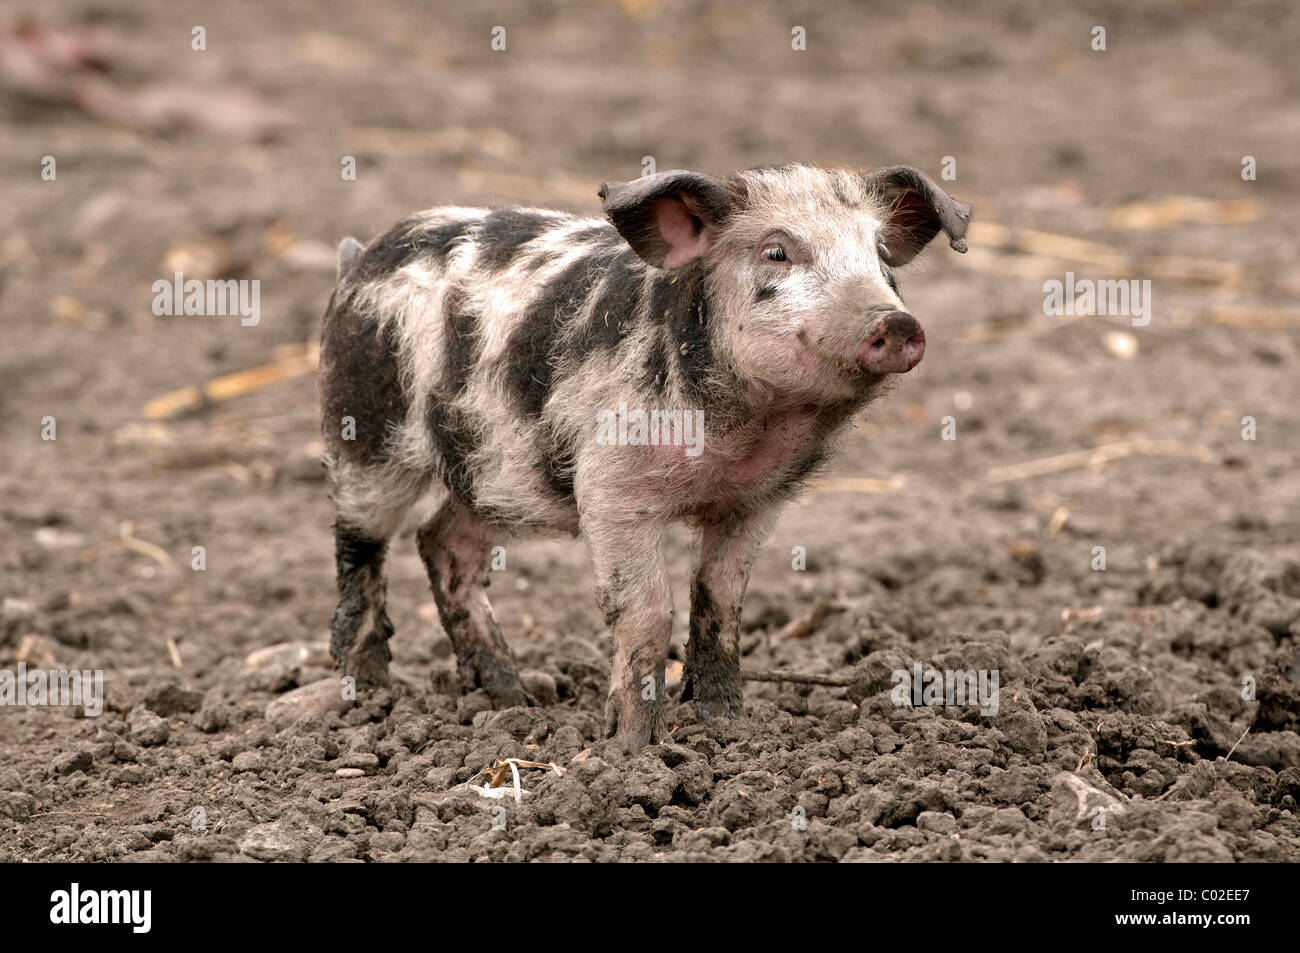 Hausschwein, Turopoljeschwein (Sus Scrofa Domestica), Ferkel. Seltene Rasse aus Kroatien. Stockbild